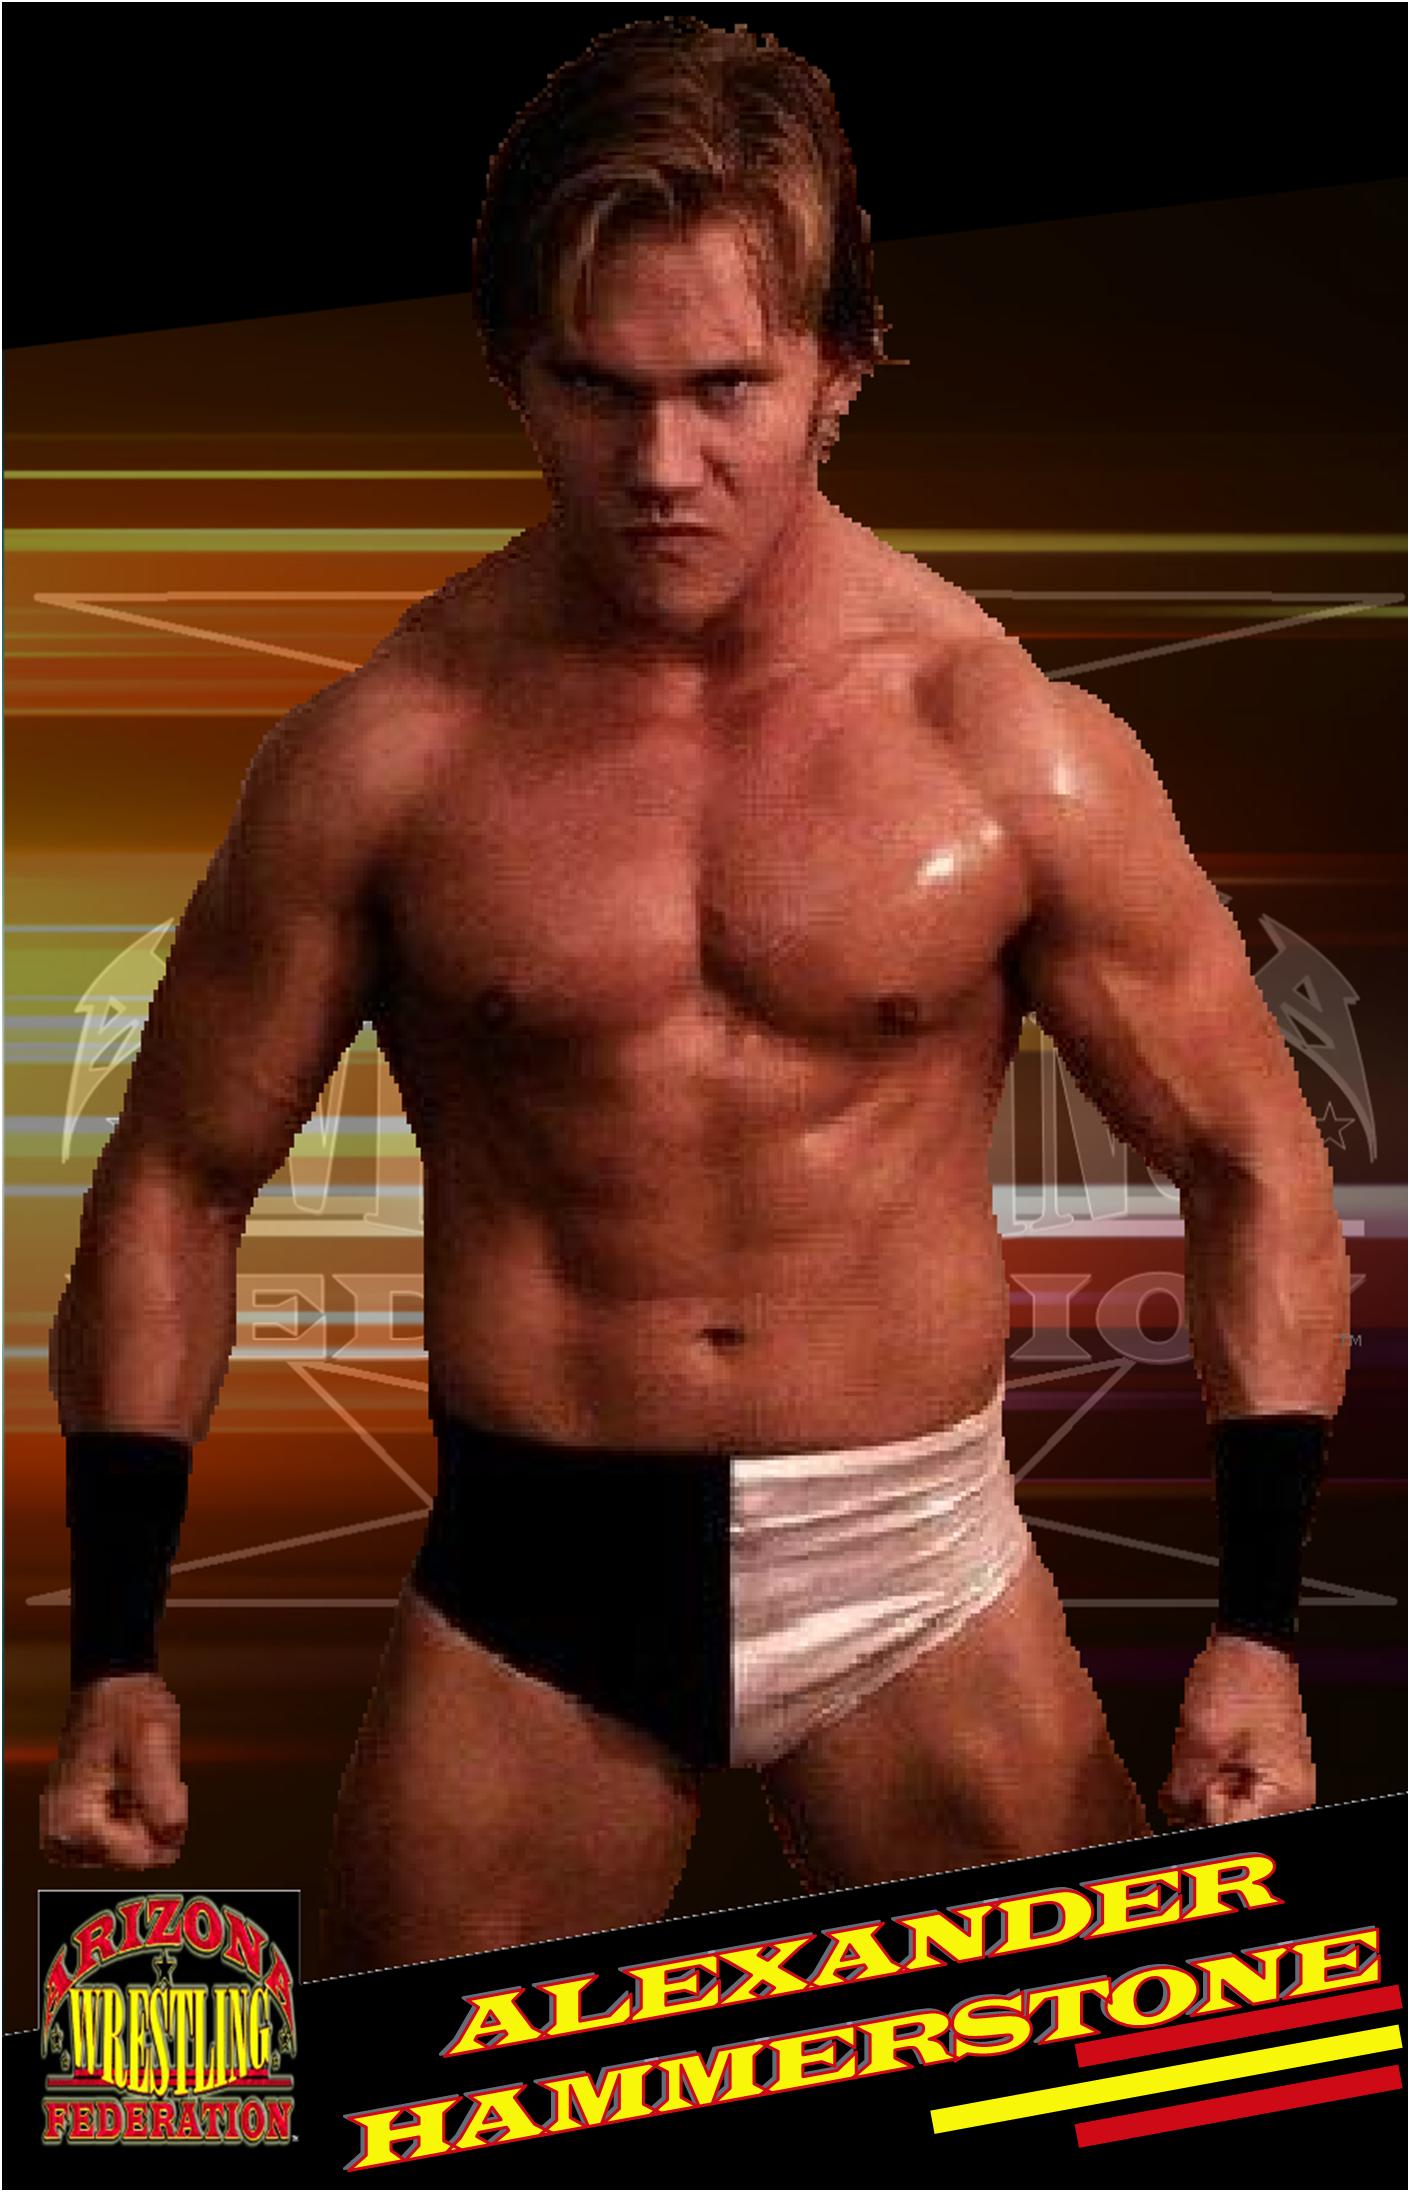 Alexander Hammerstone - Arizona Wrestling Federation